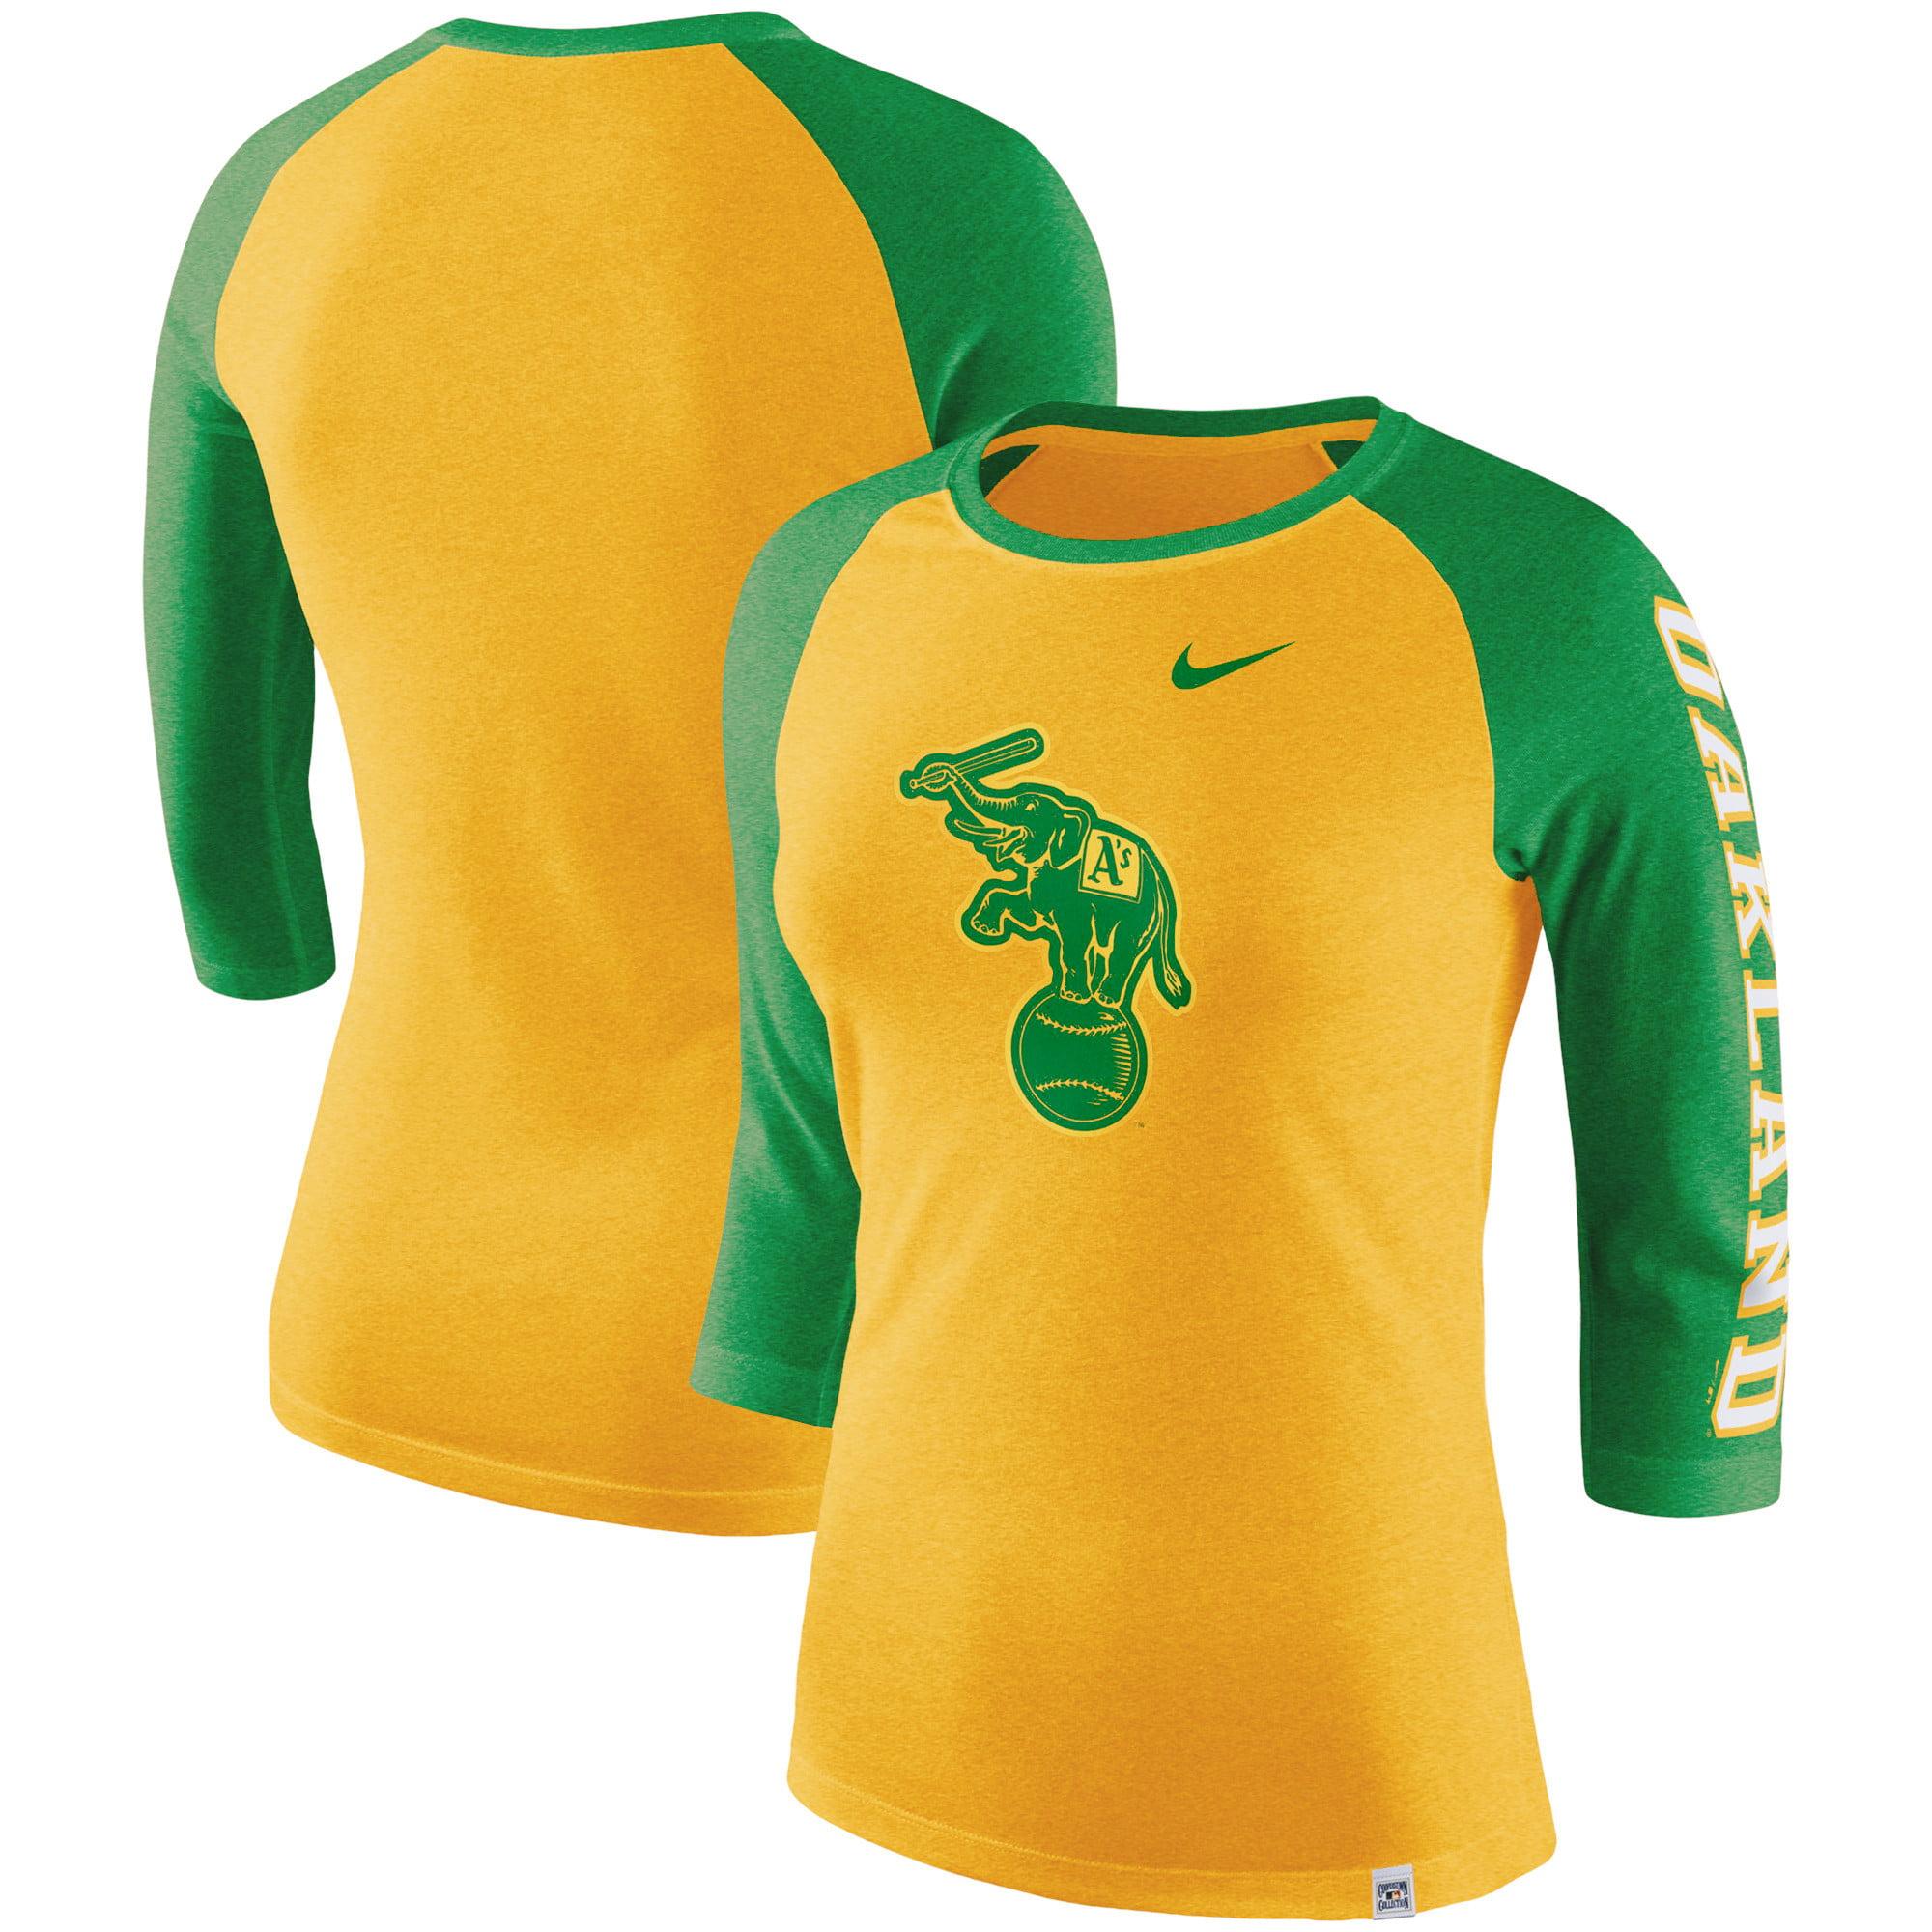 Oakland Athletics Nike Women's Vintage Logo Tri-Blend 3/4-Sleeve Raglan T-Shirt - Heathered Gold/Kelly Green